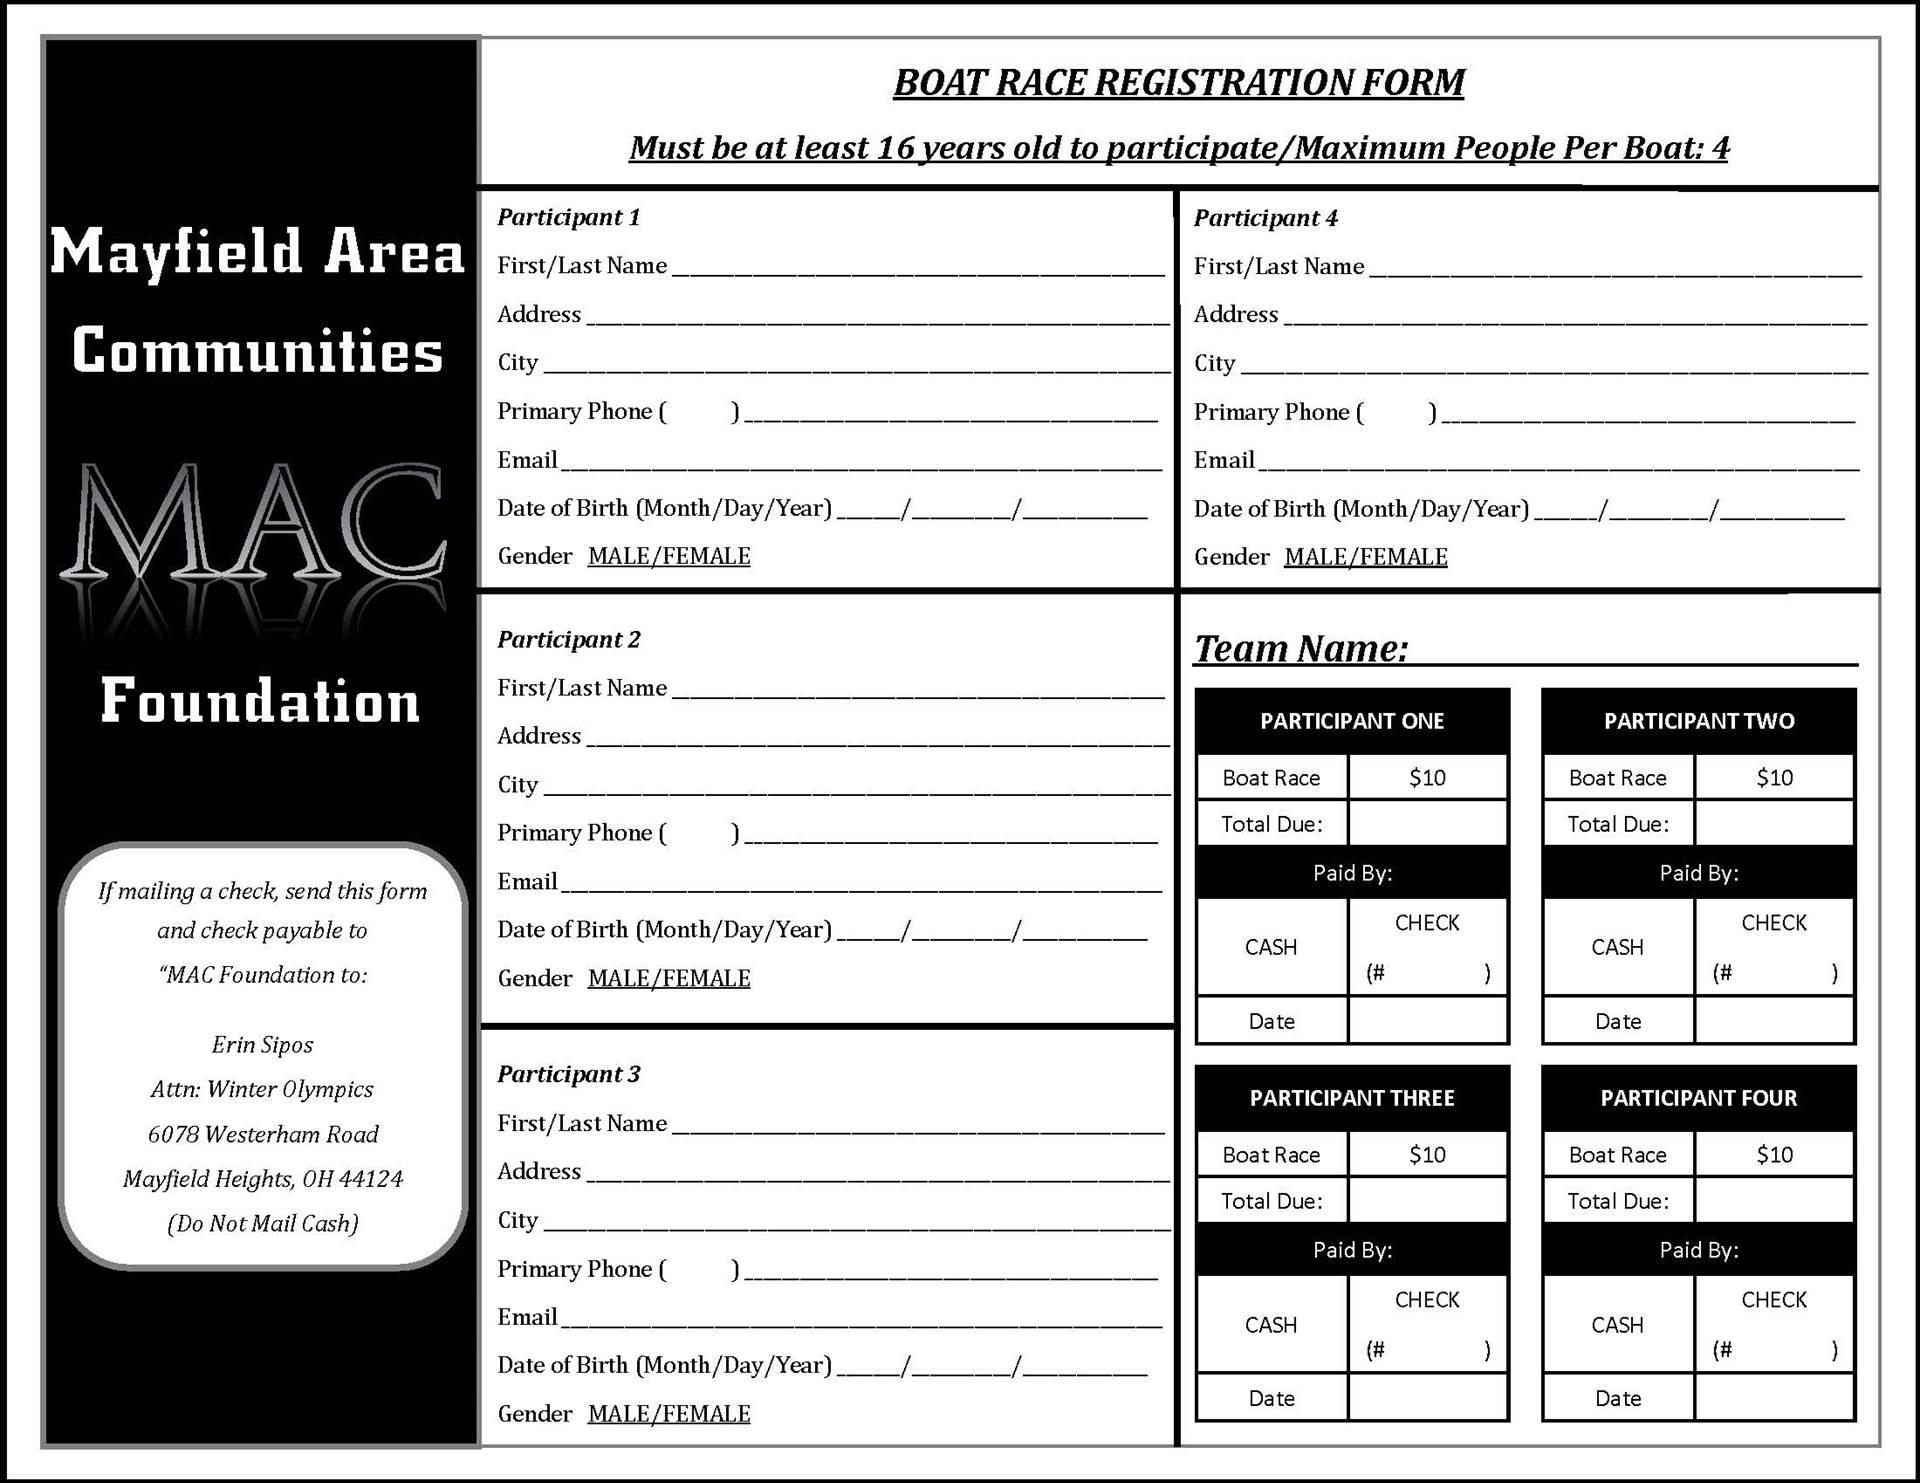 MAC Foundation Cardboard Boat Contest registration page